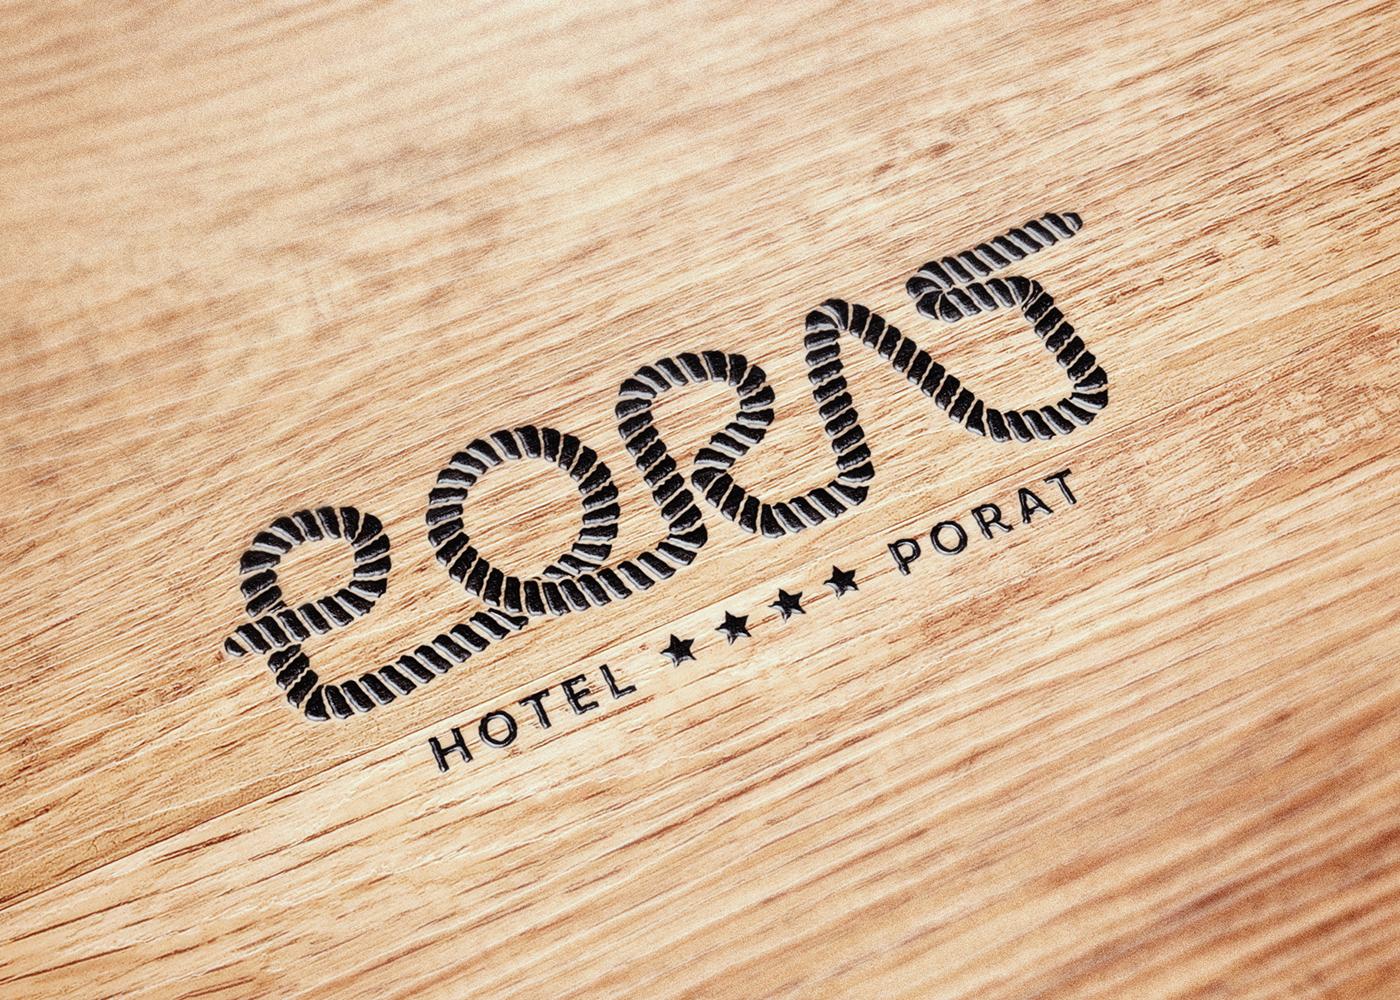 Visual identity of Hotel Porat